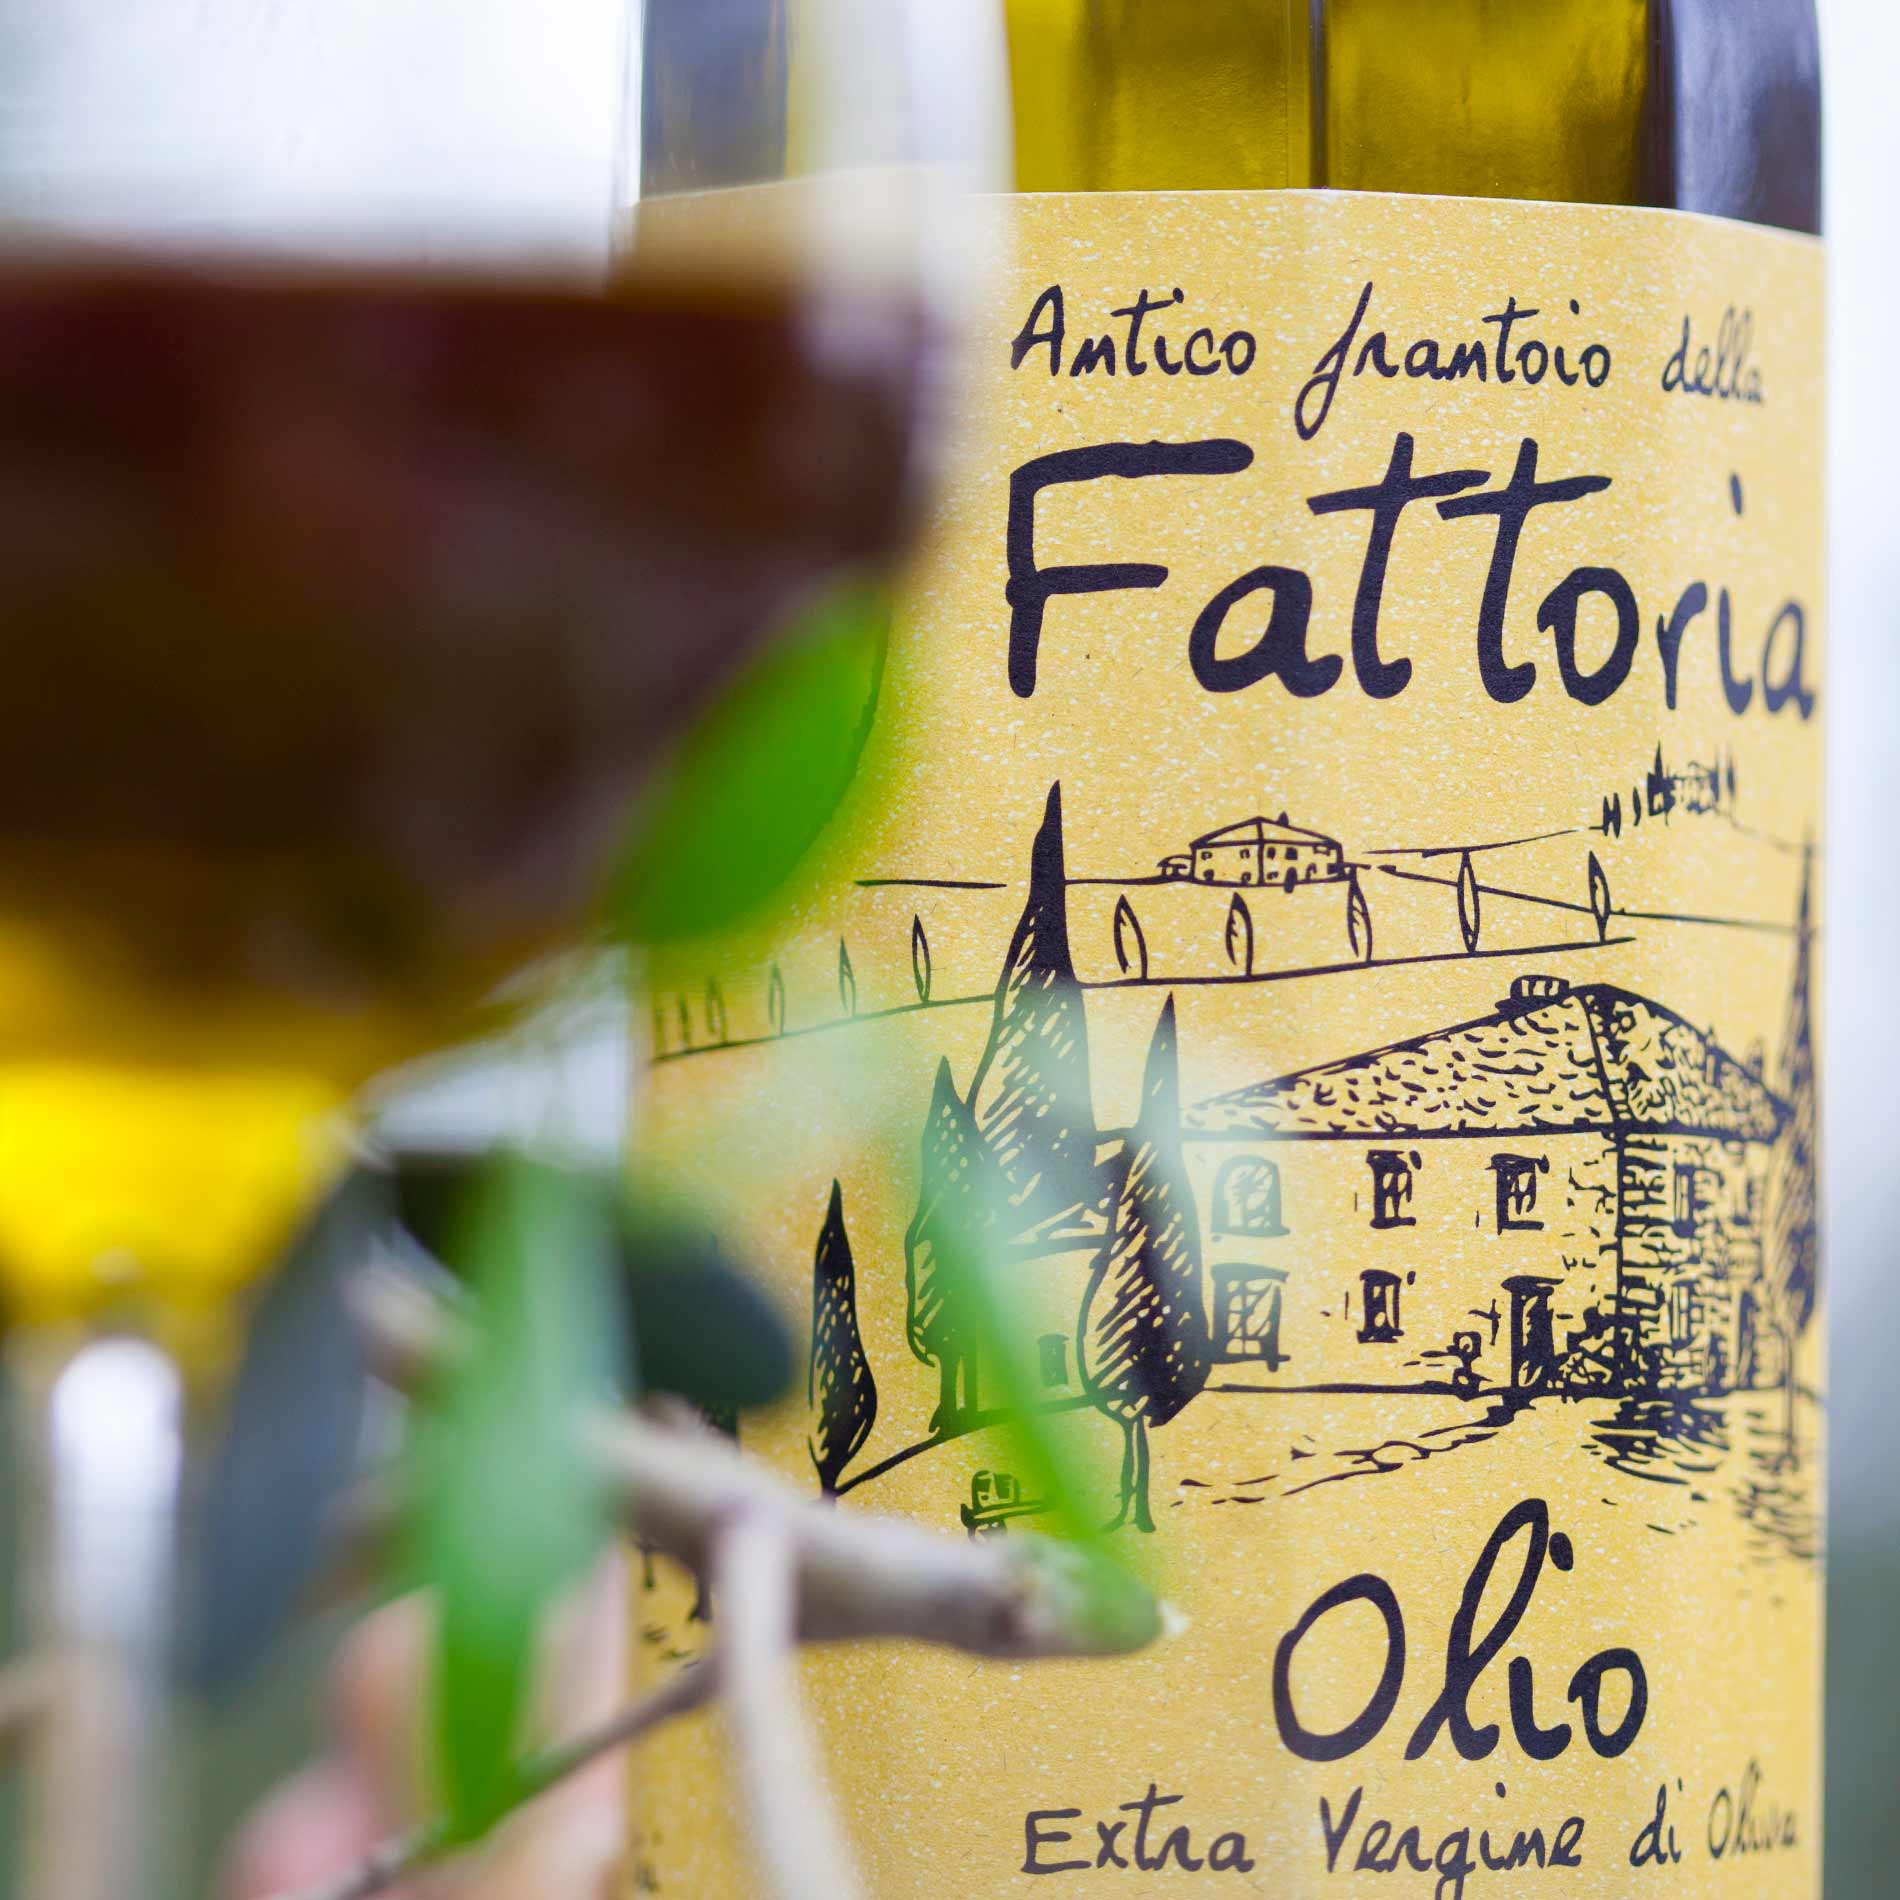 Stiftung Warentest Olivenöl 2016